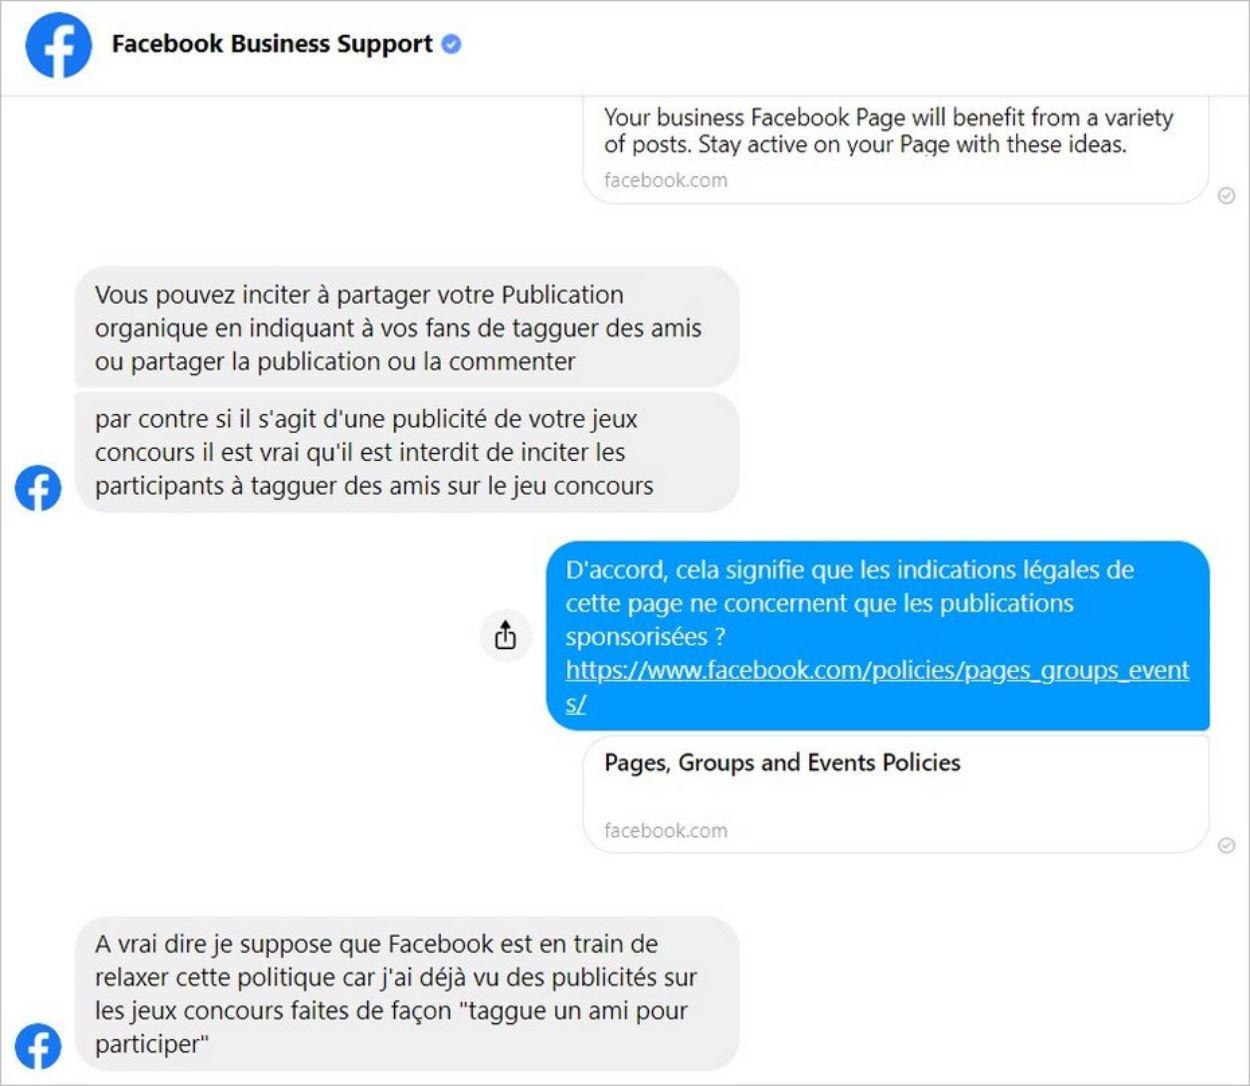 Discussion juridique avec Facebook